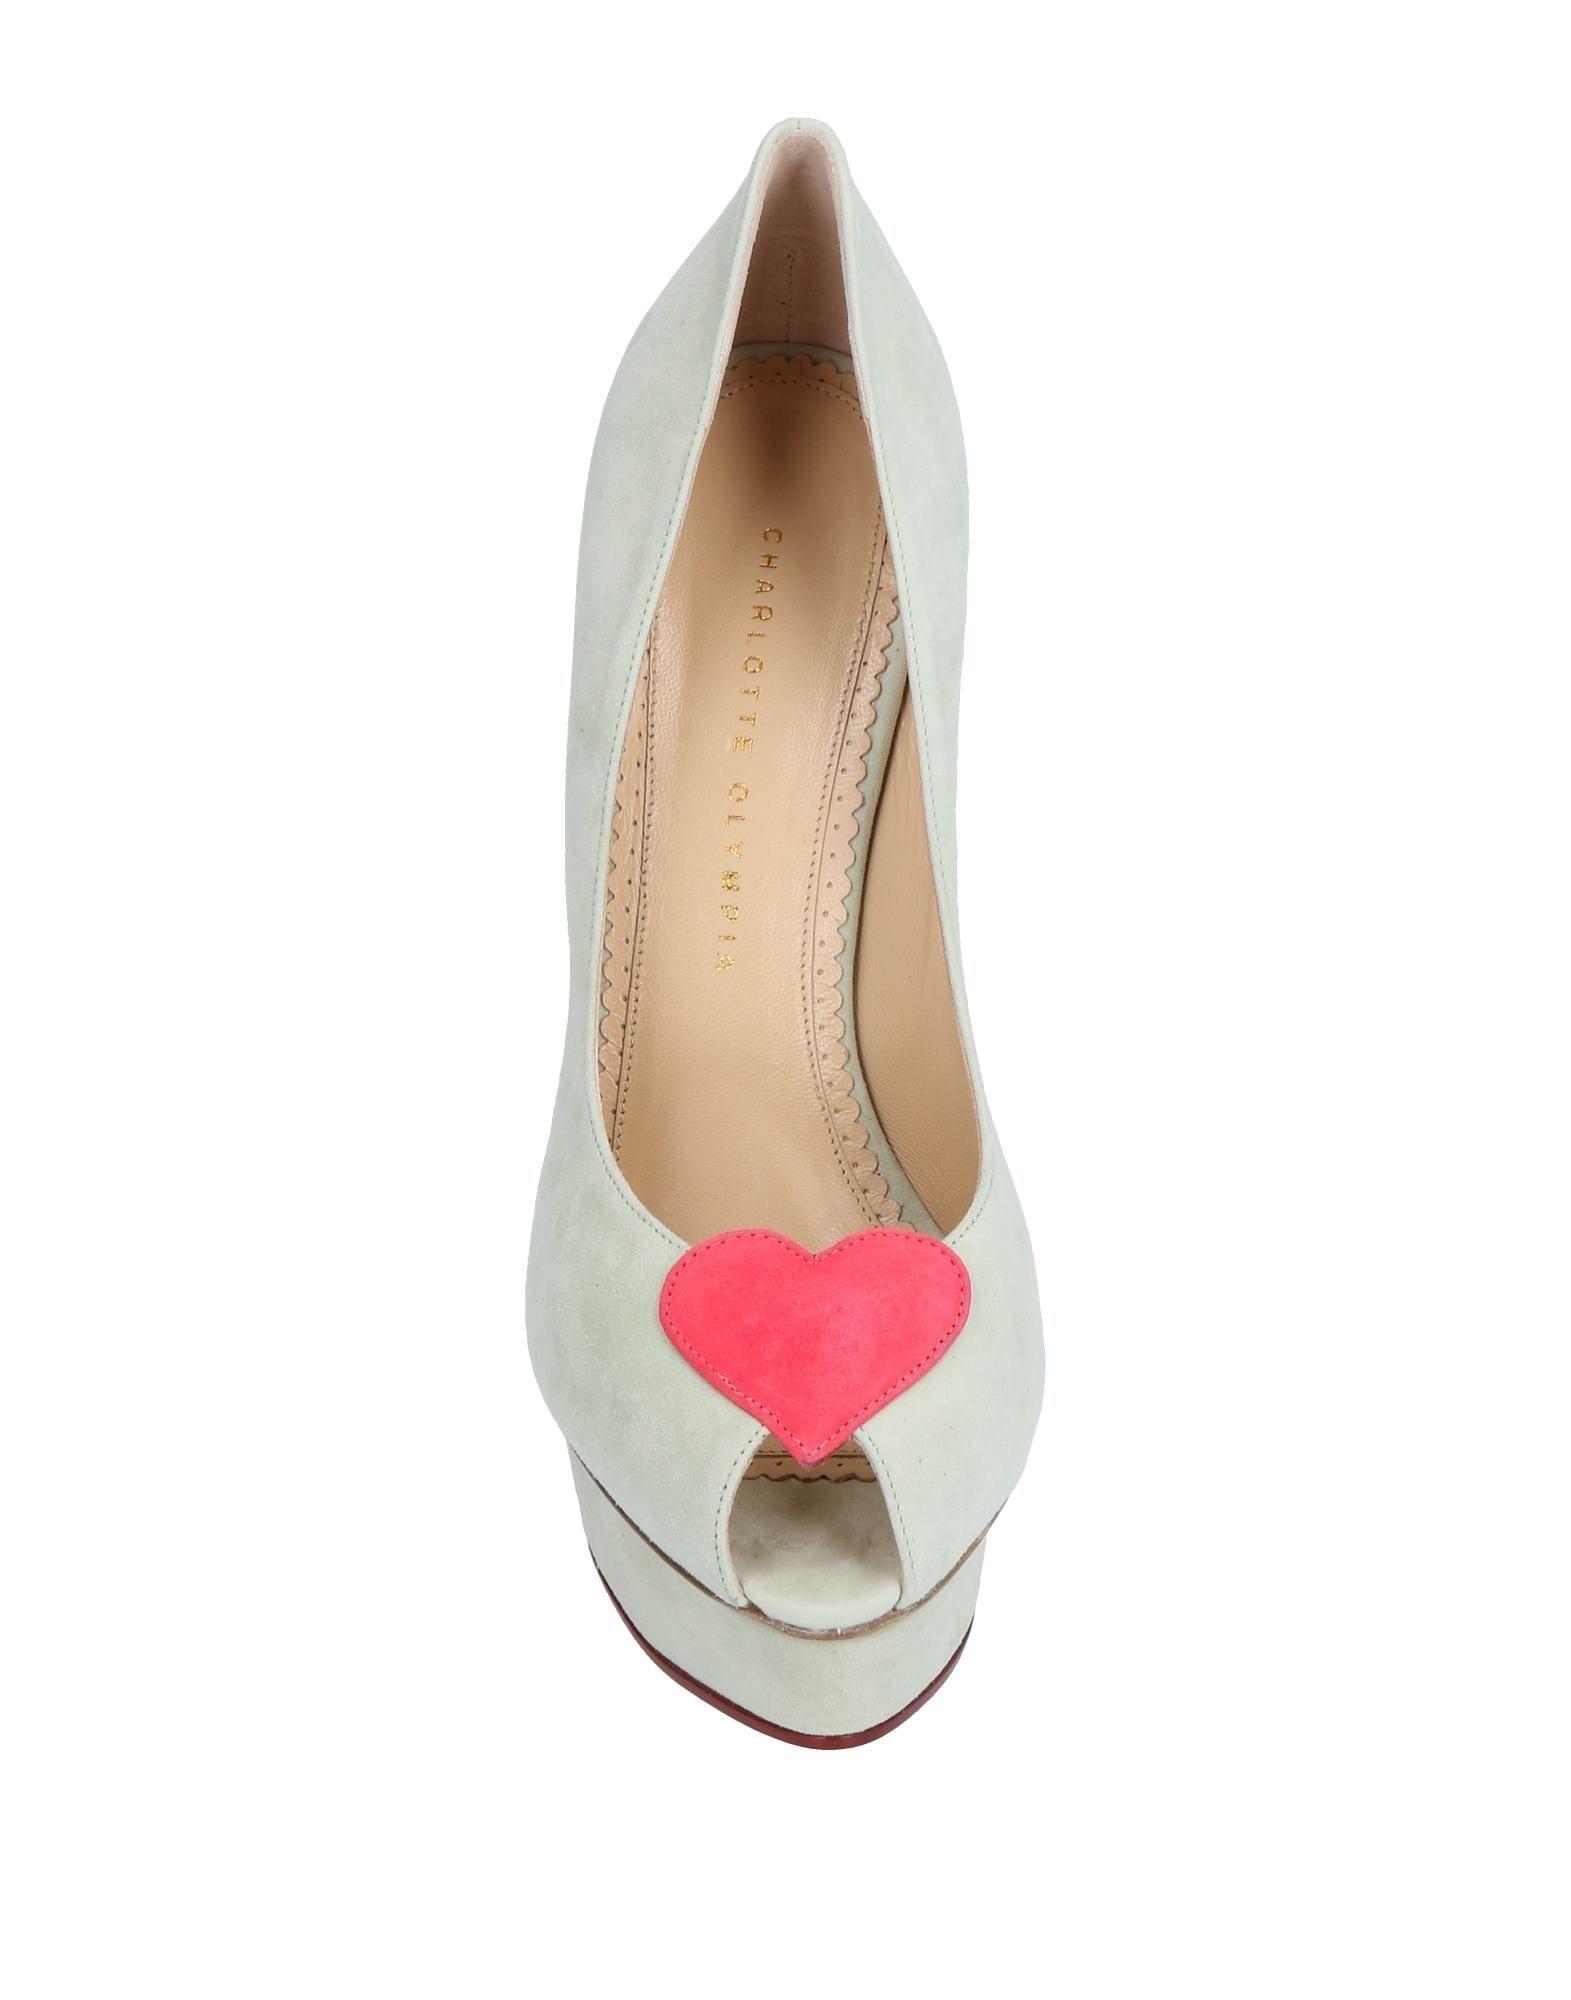 Rabatt Schuhe Charlotte Olympia  Pumps Damen  Olympia 11500066US bccfca